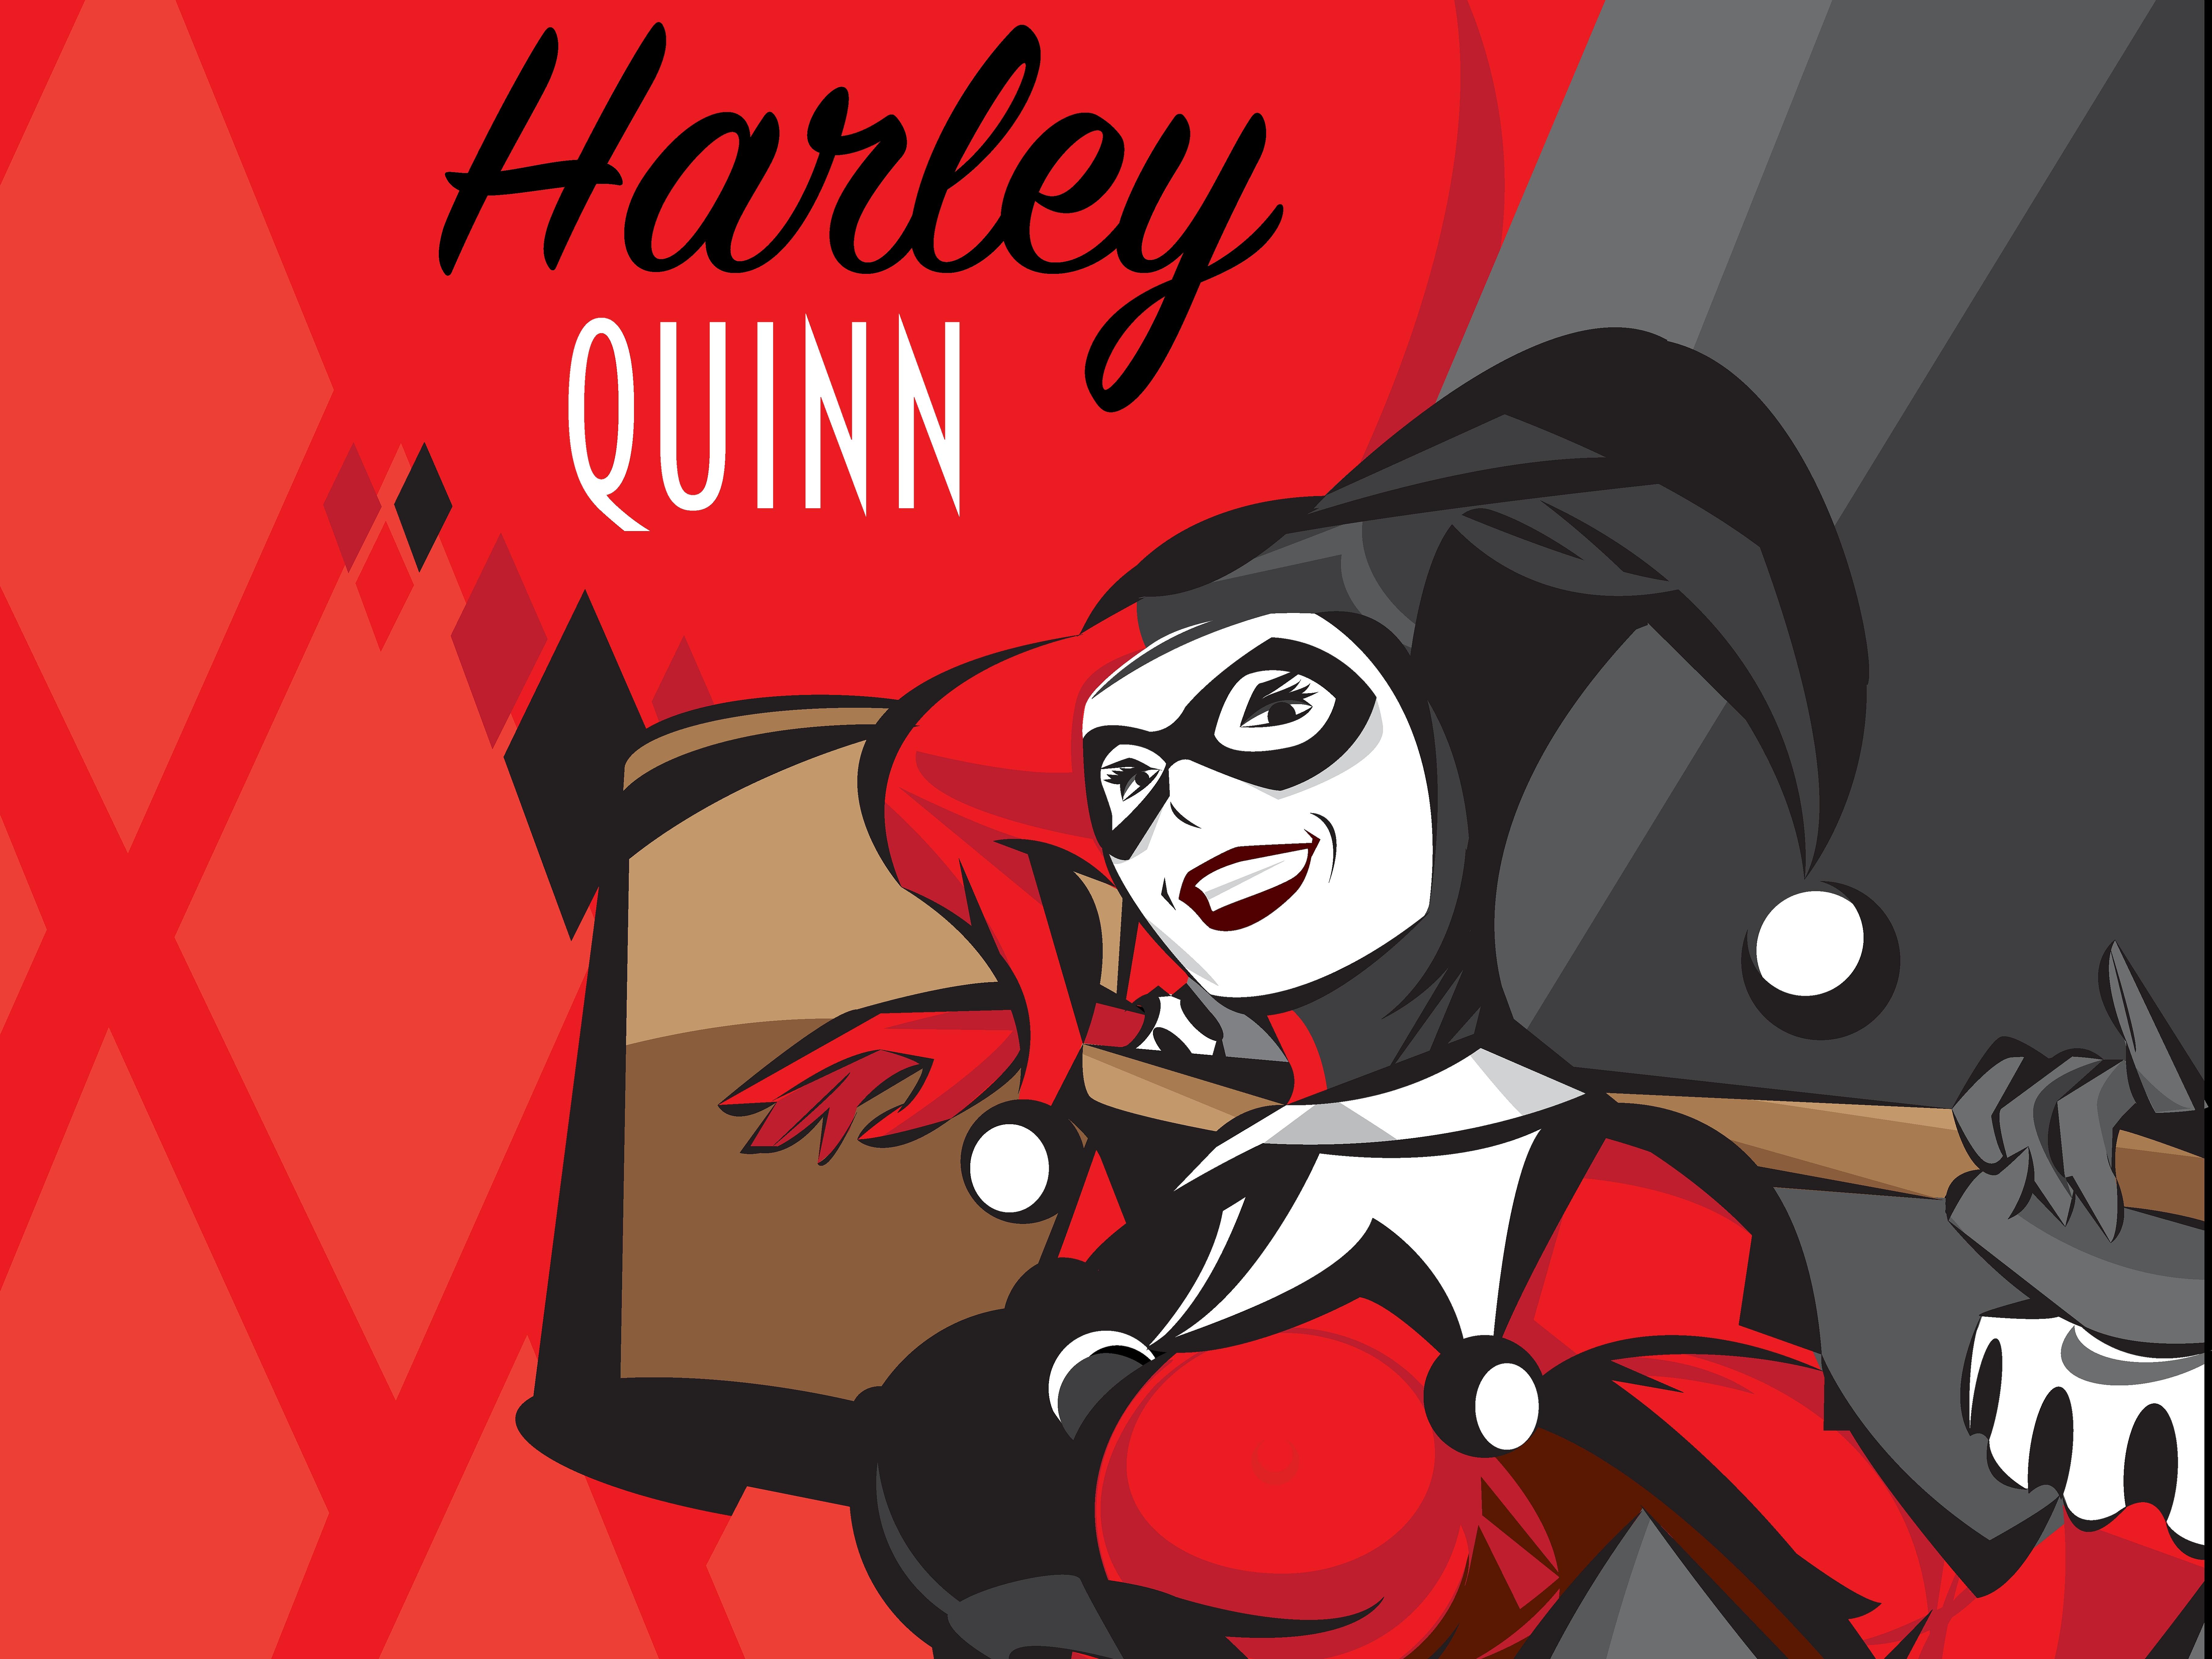 dc comics, Superhero, Hero, Warrior, D c, Comics, Harley